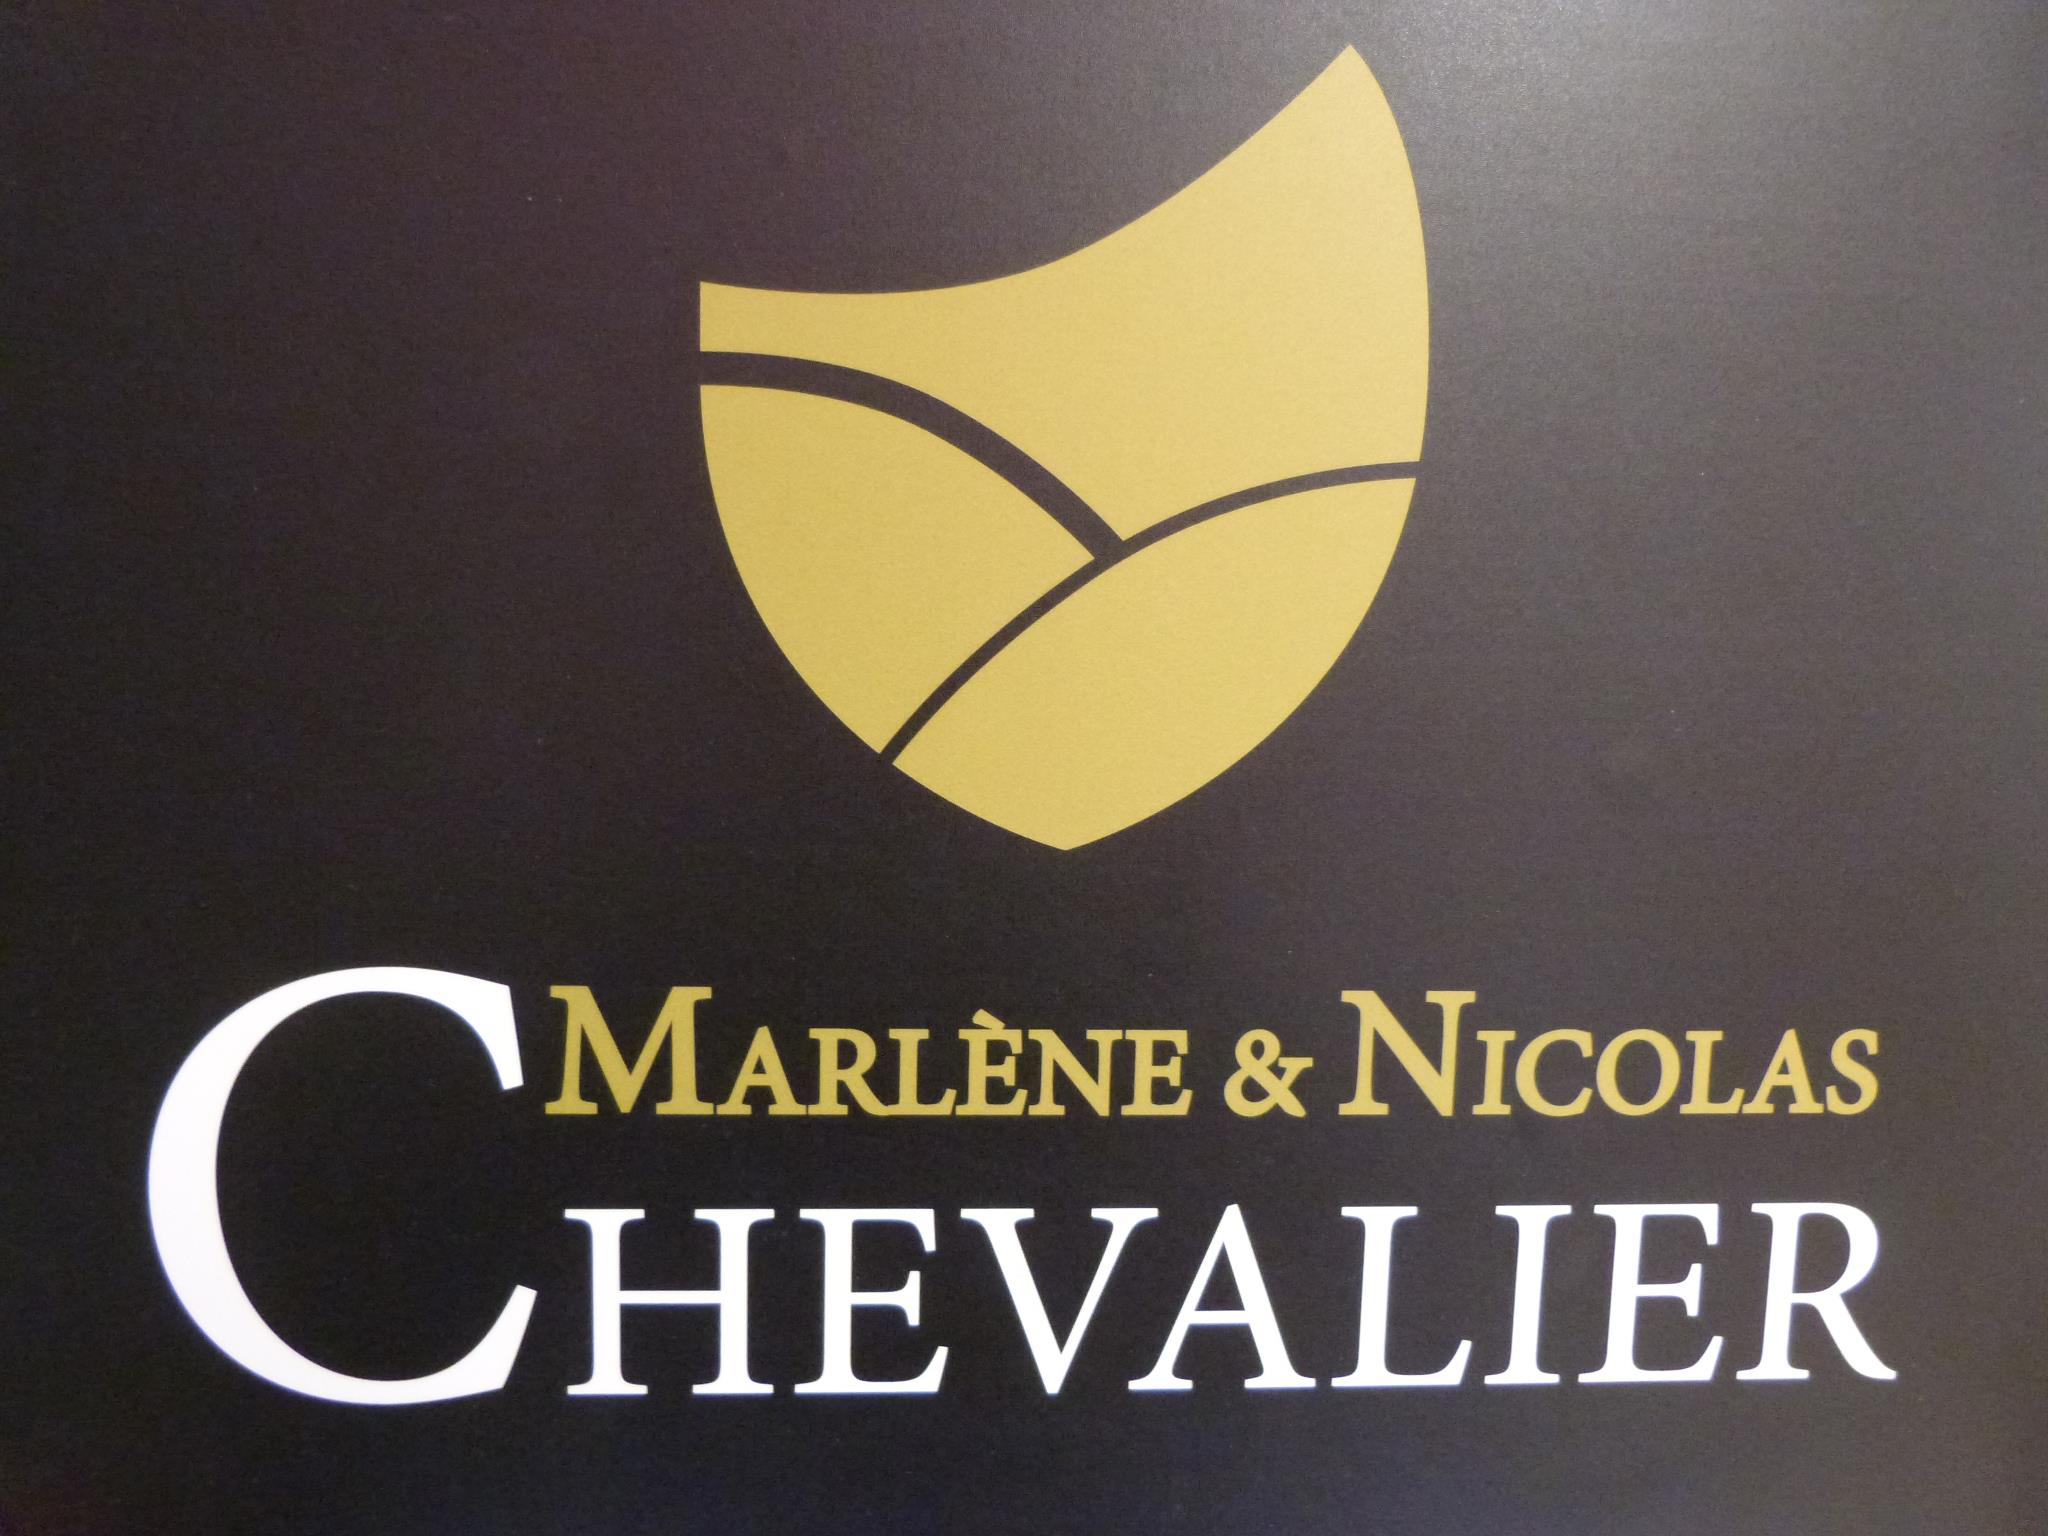 Cave Chevalier